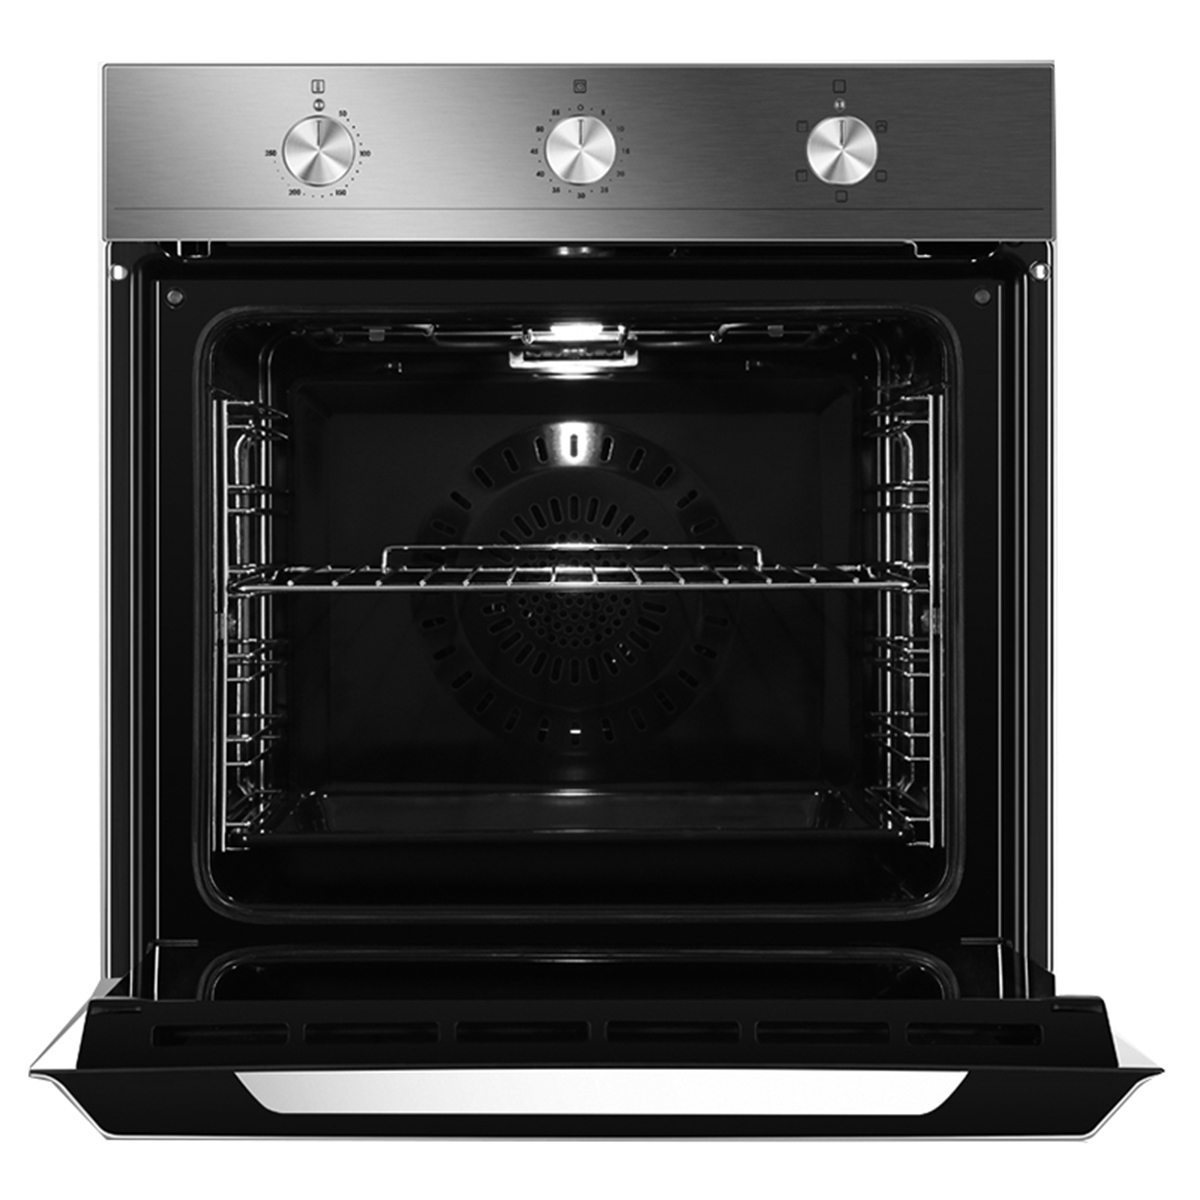 Casarte/卡萨帝                         嵌入式厨电                         C5O60MM5X1